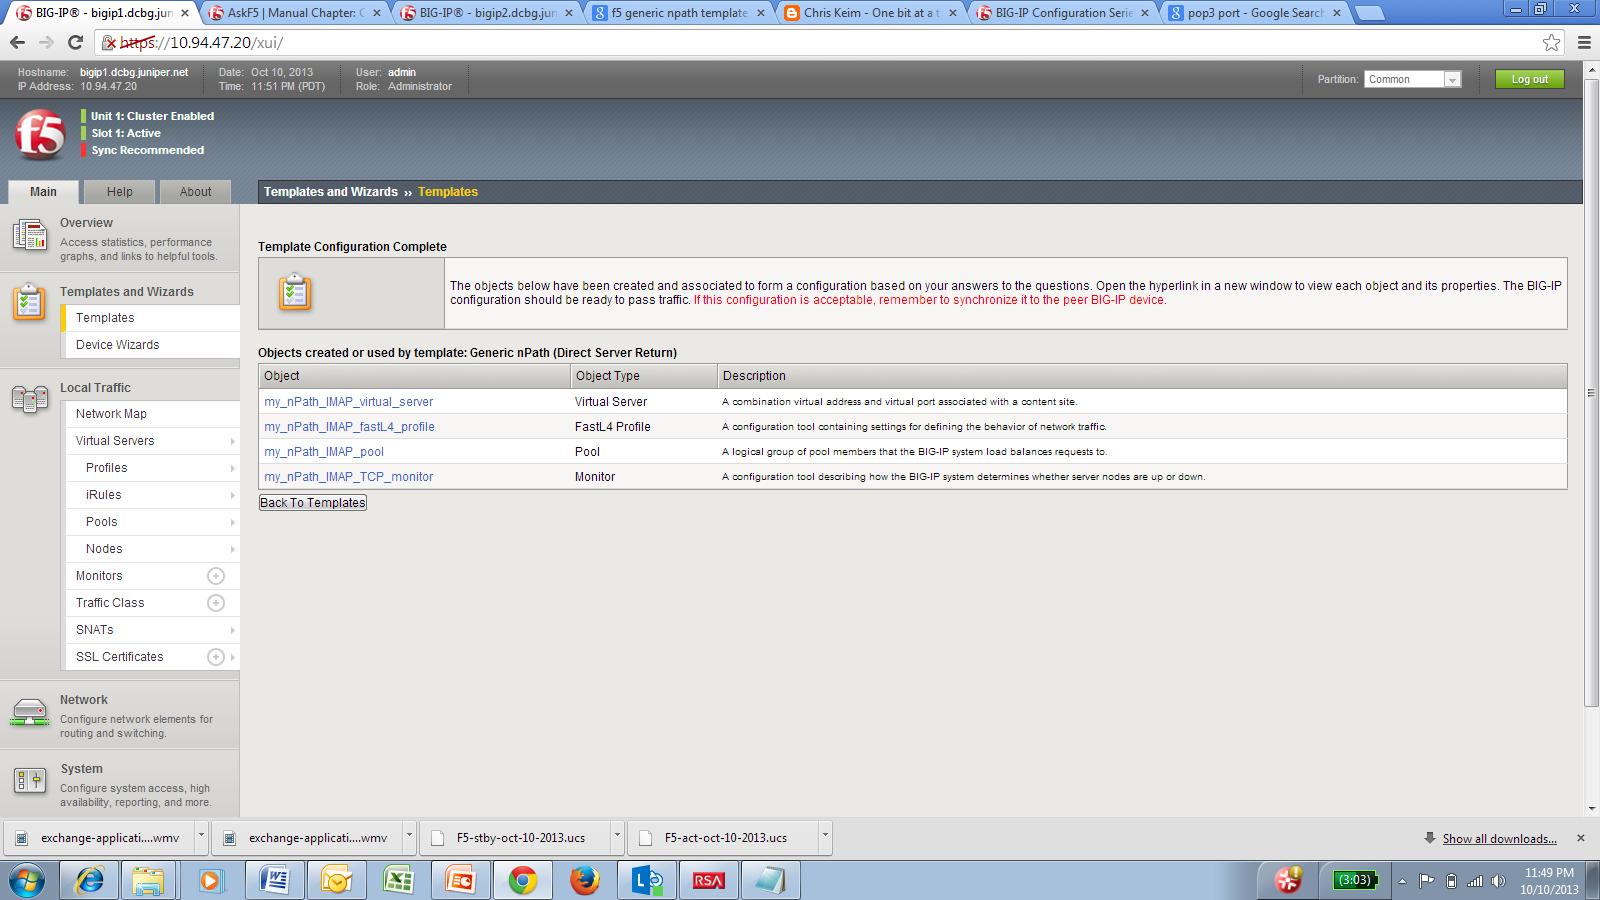 Load Balancing - Technical Documentation - Support - Juniper